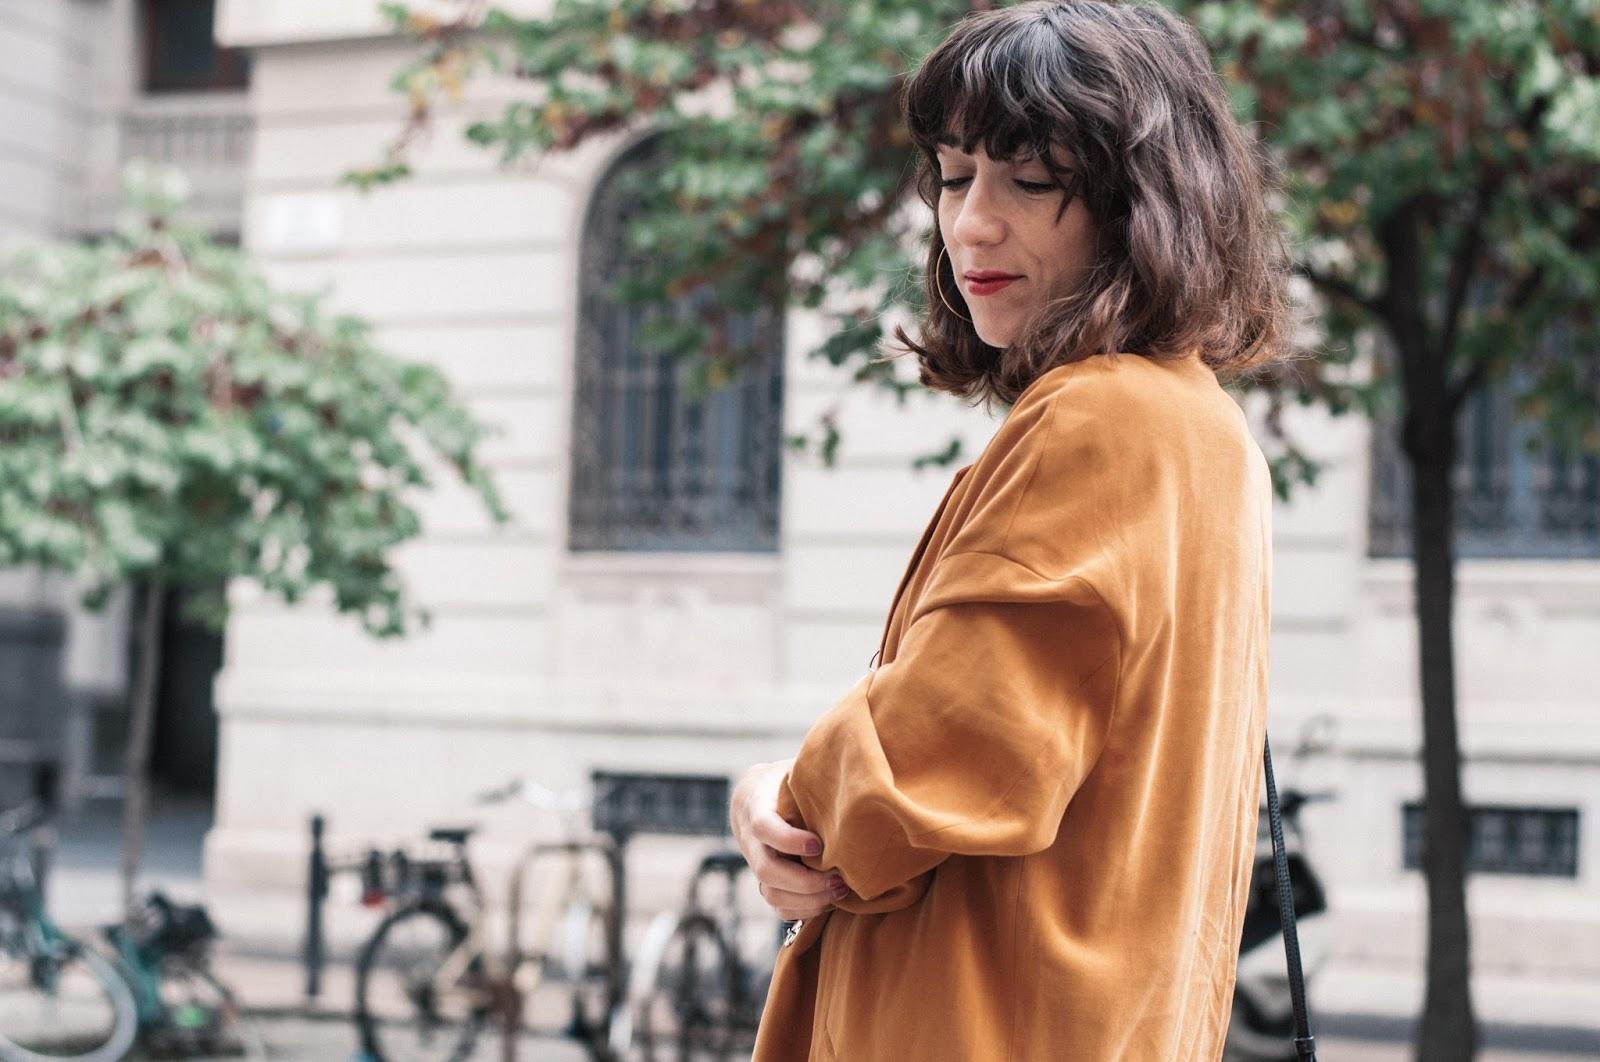 Jeans Maje, blusa H&M, blazer Mango, zapatos Menbur, bolso & Other Stories